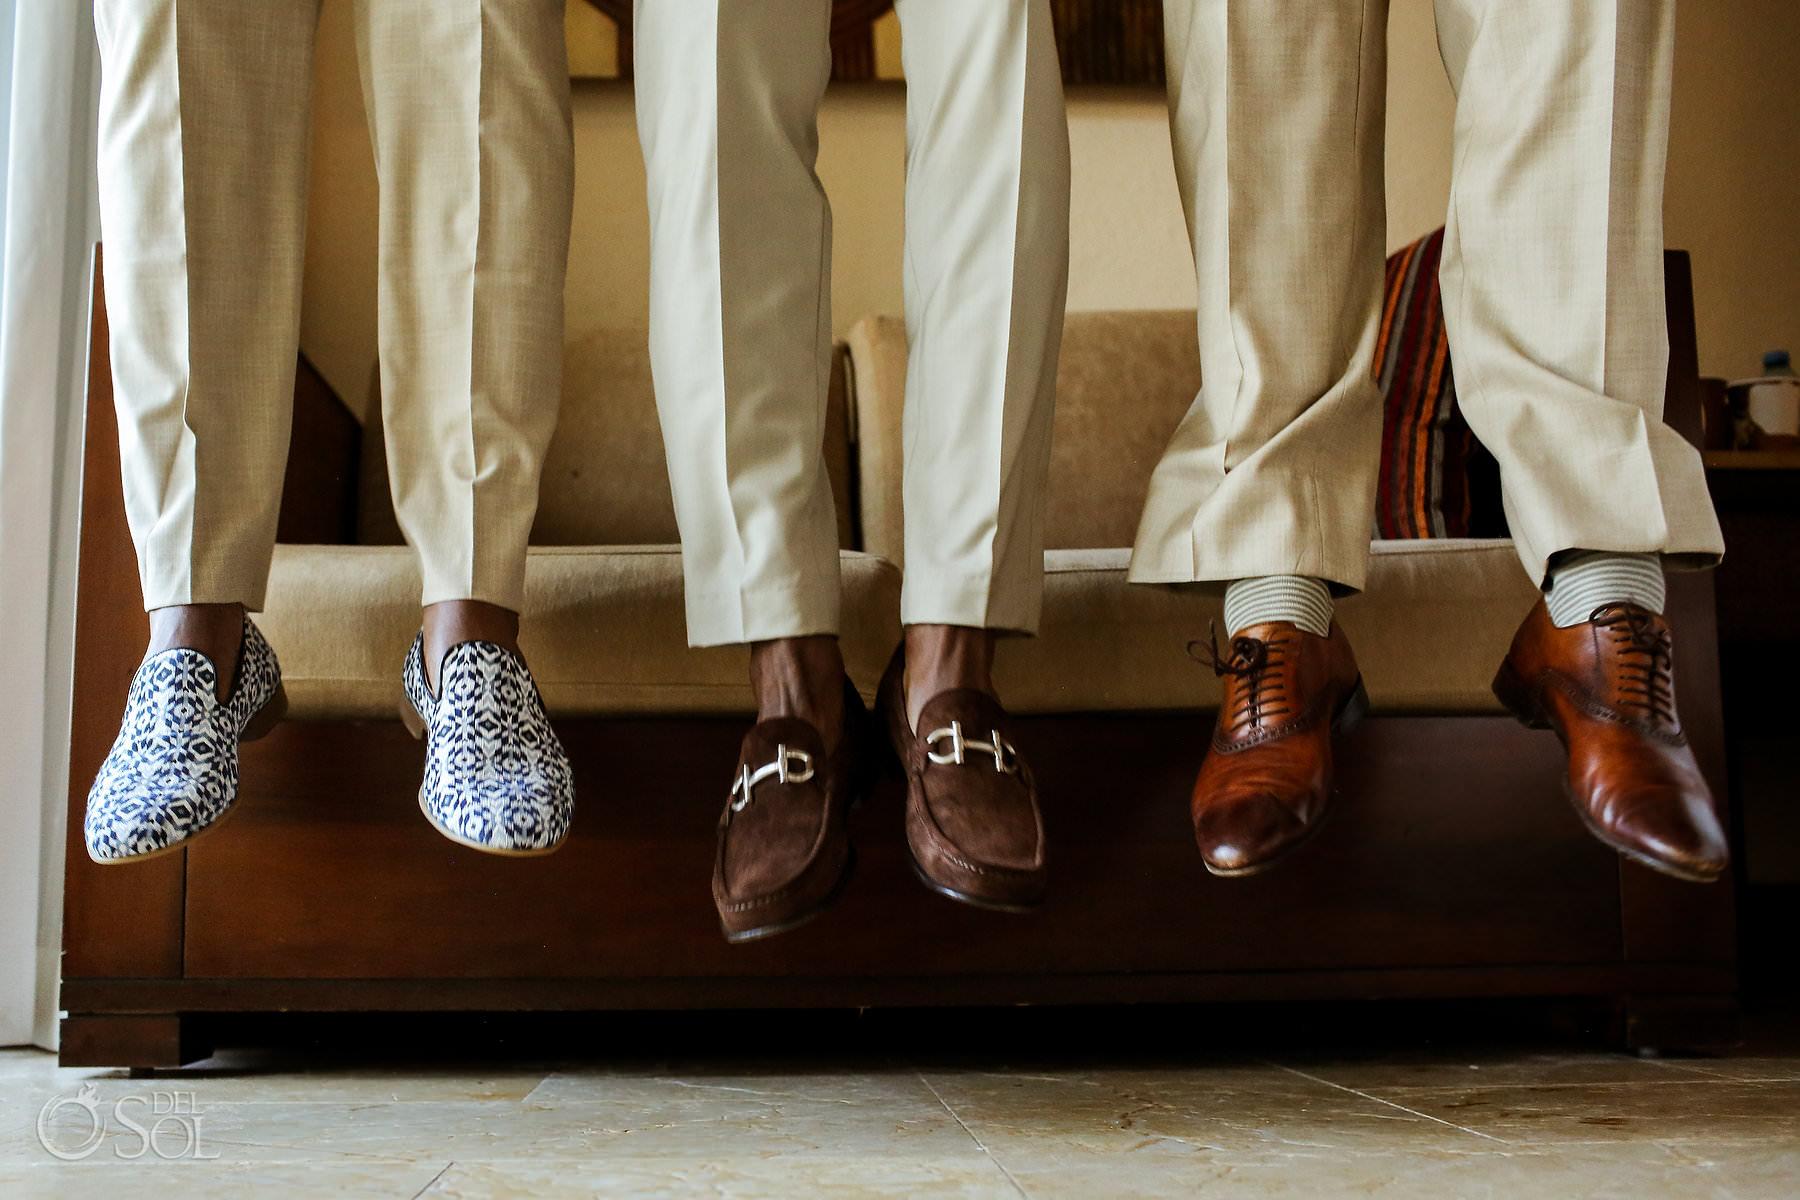 Groom groomsmen wedding shoe ideas creative photography